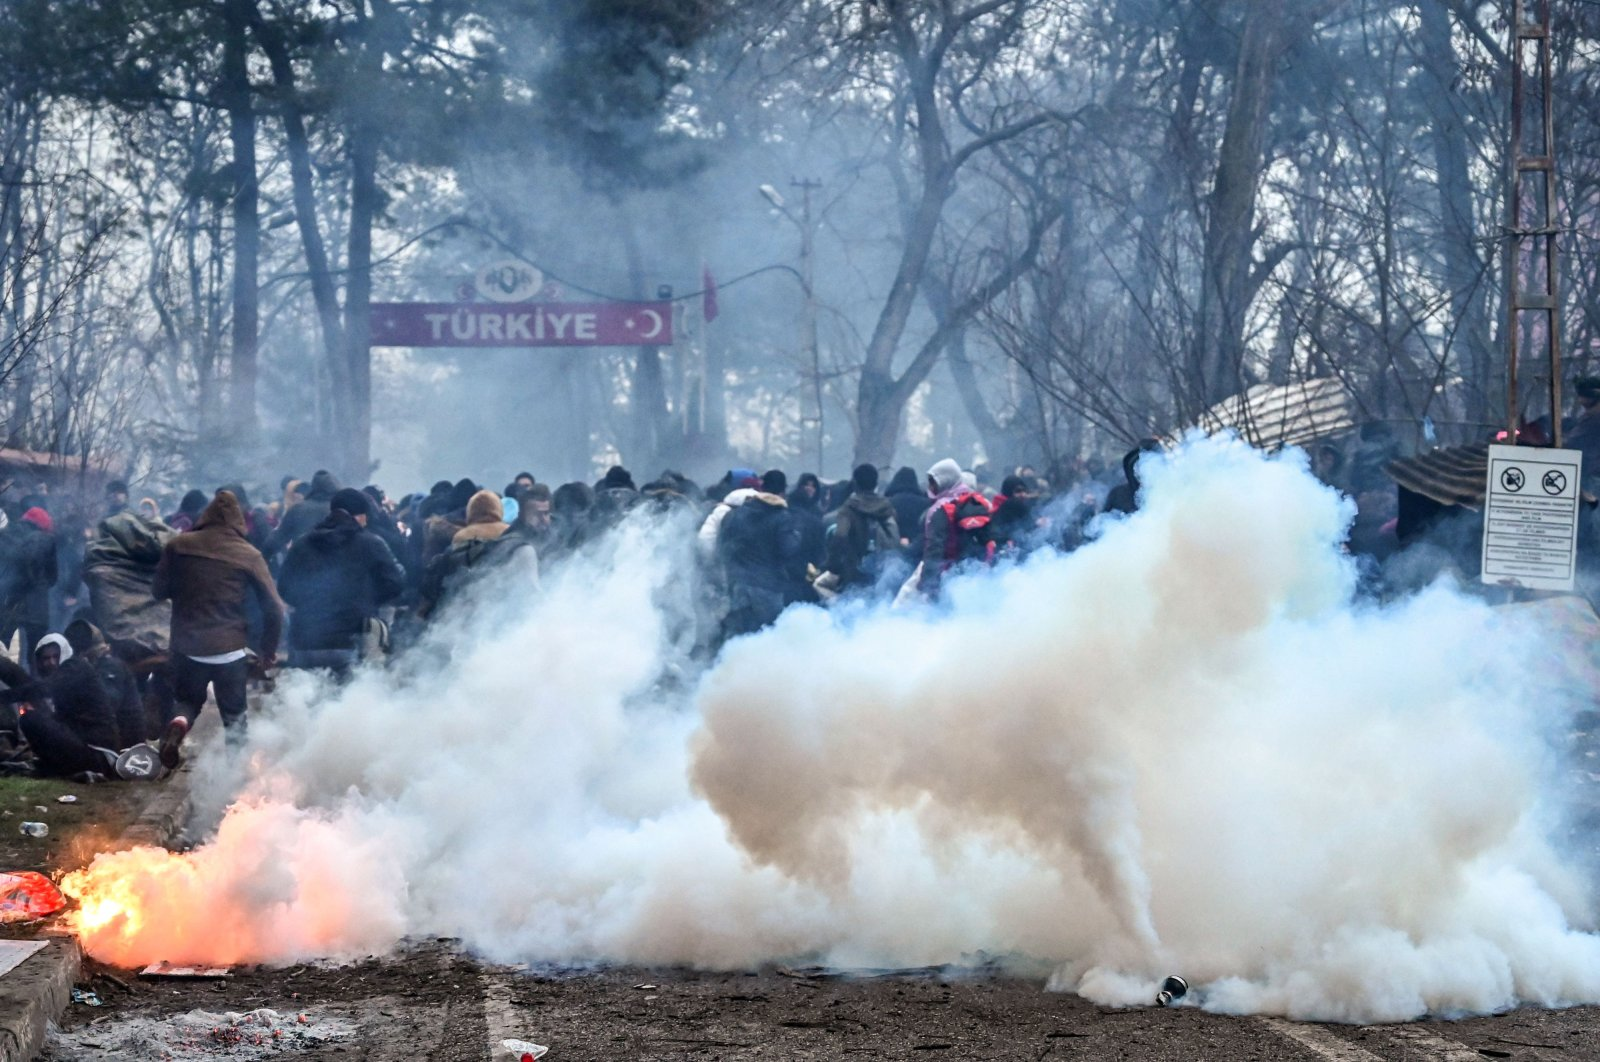 Migrants run away as Greek anti-riot police use tear gas on the buffer zone along the Turkey-Greece border in Edirne's Pazarkule, Turkey, Feb. 29, 2020. (AFP Photo)